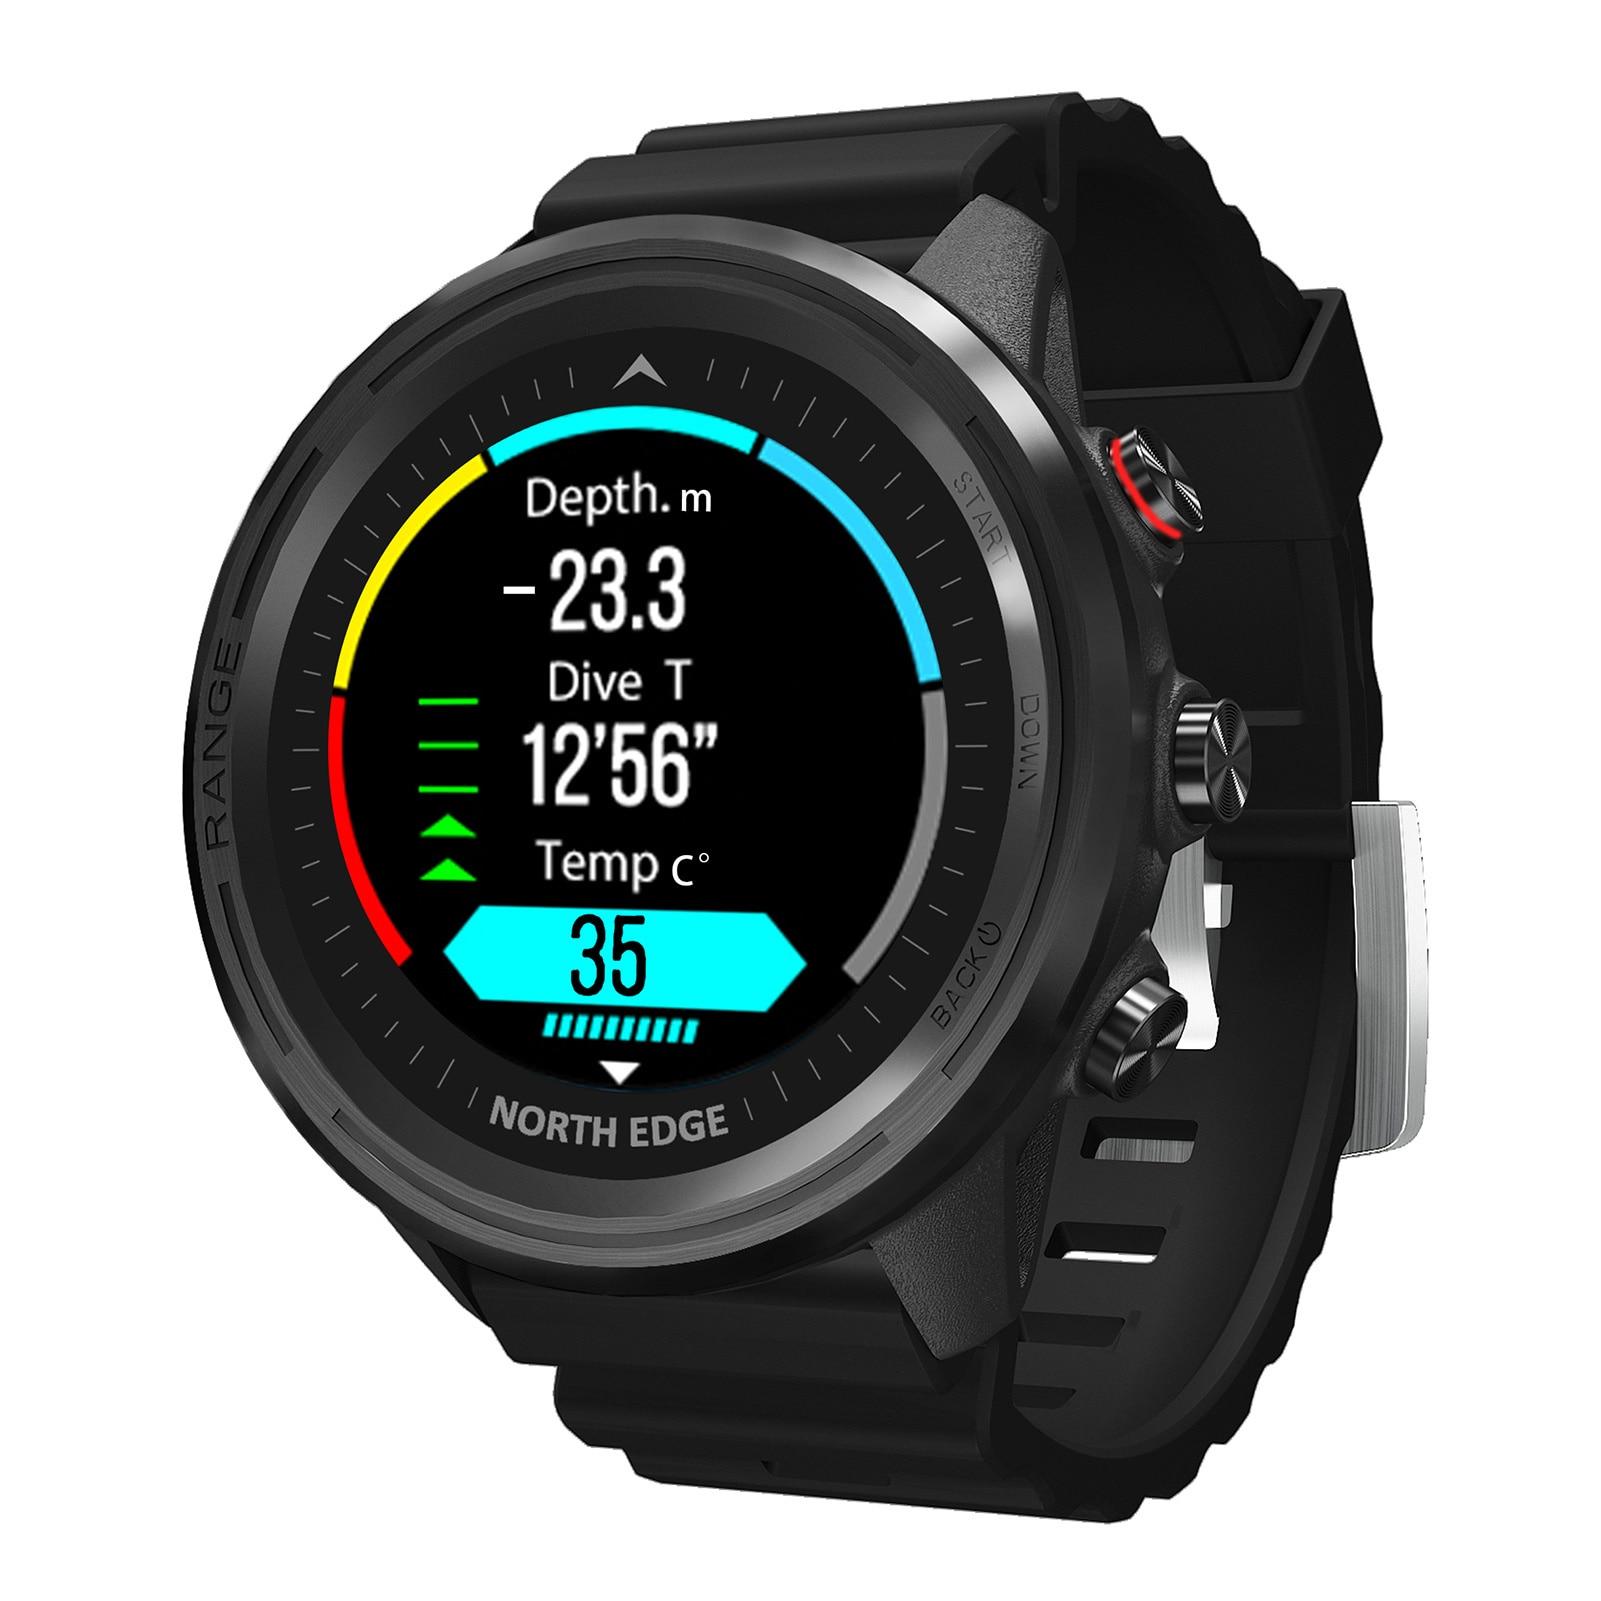 NORTH EDGE Range5 Watches Smart Watch Men Women Heart Rate Monitor Fitness Sport Watches GPS Activity Tracker Smartwatch